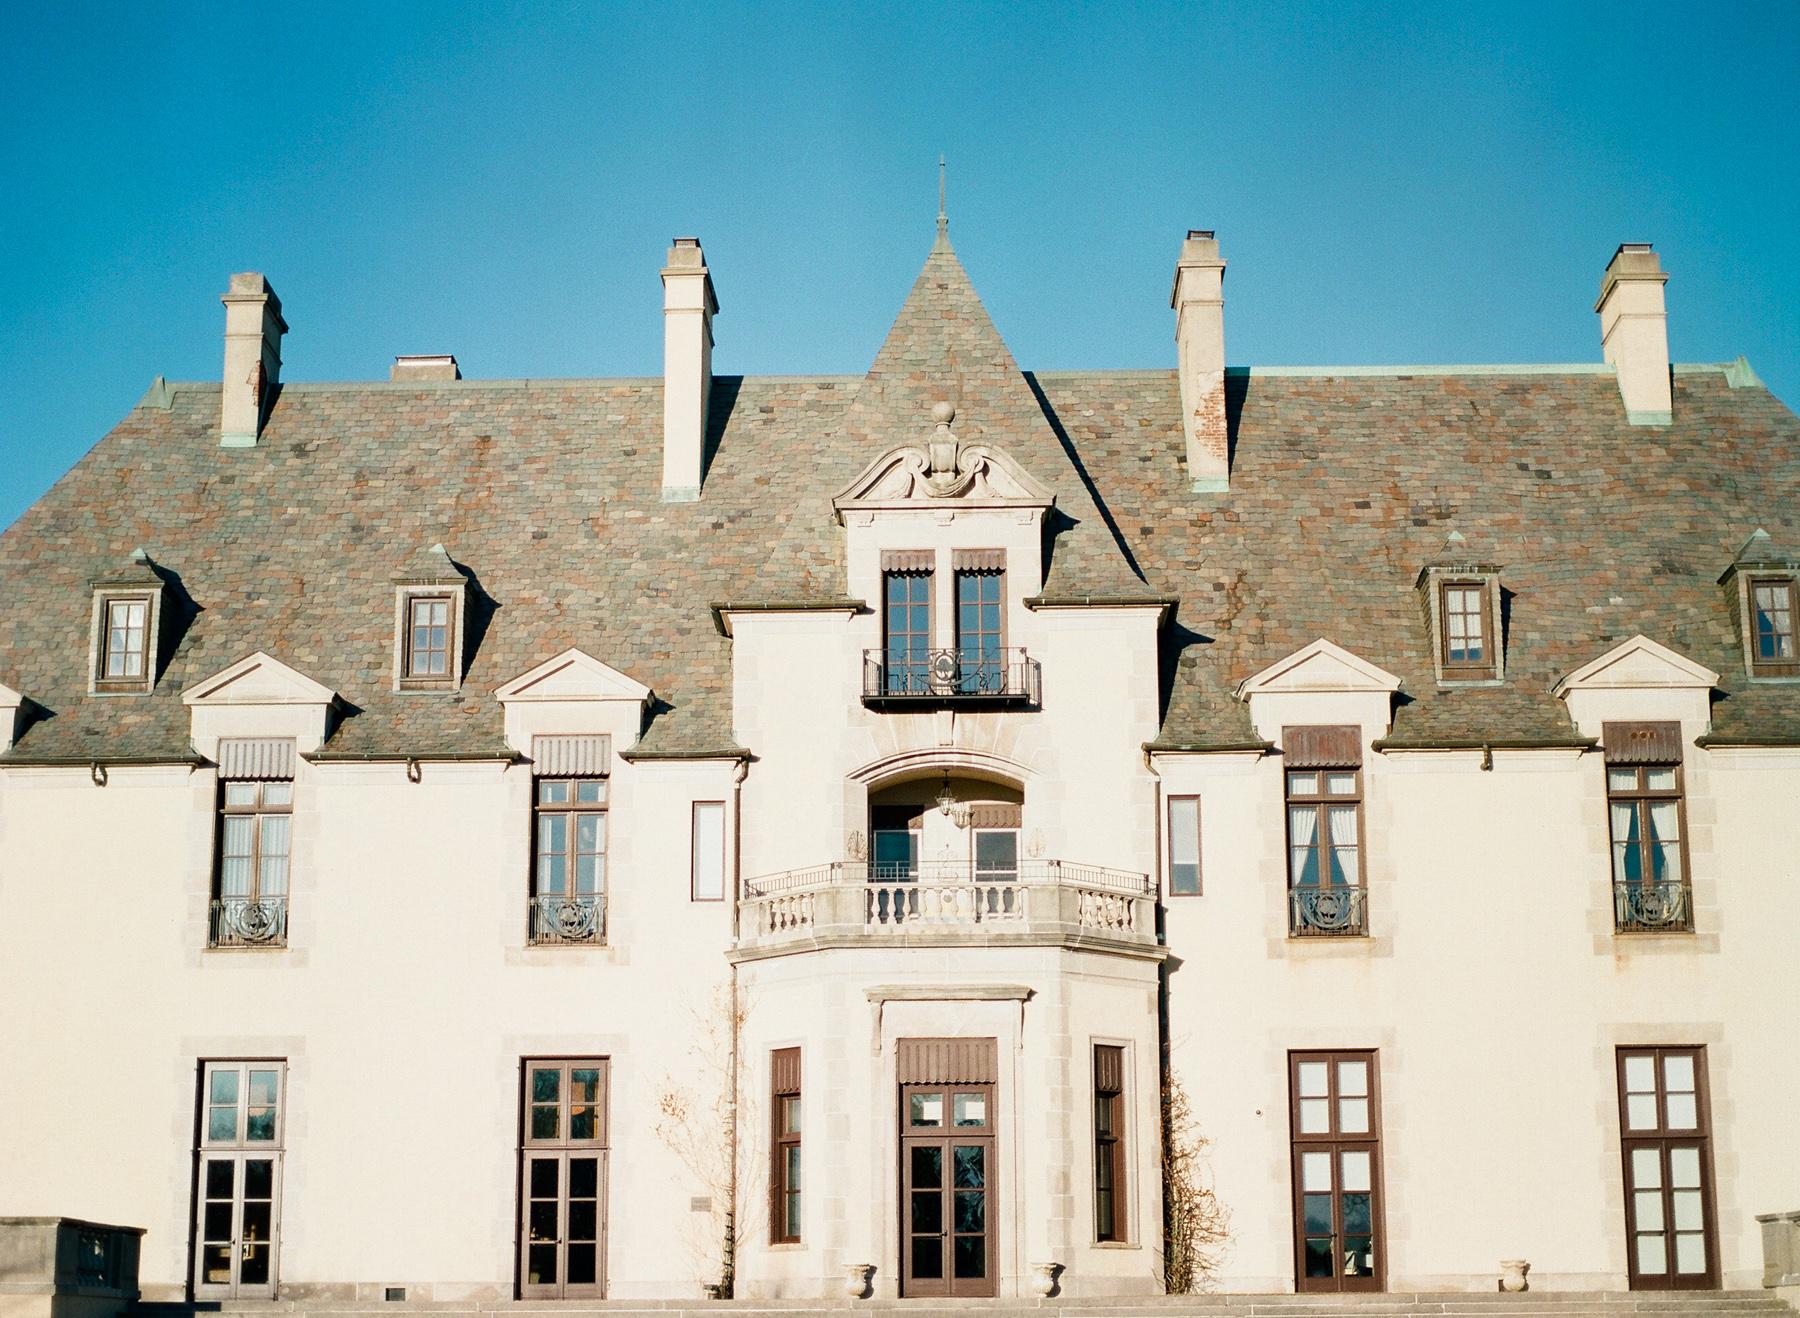 Brian-McKnight-wedding-oheka-castle-002.jpg